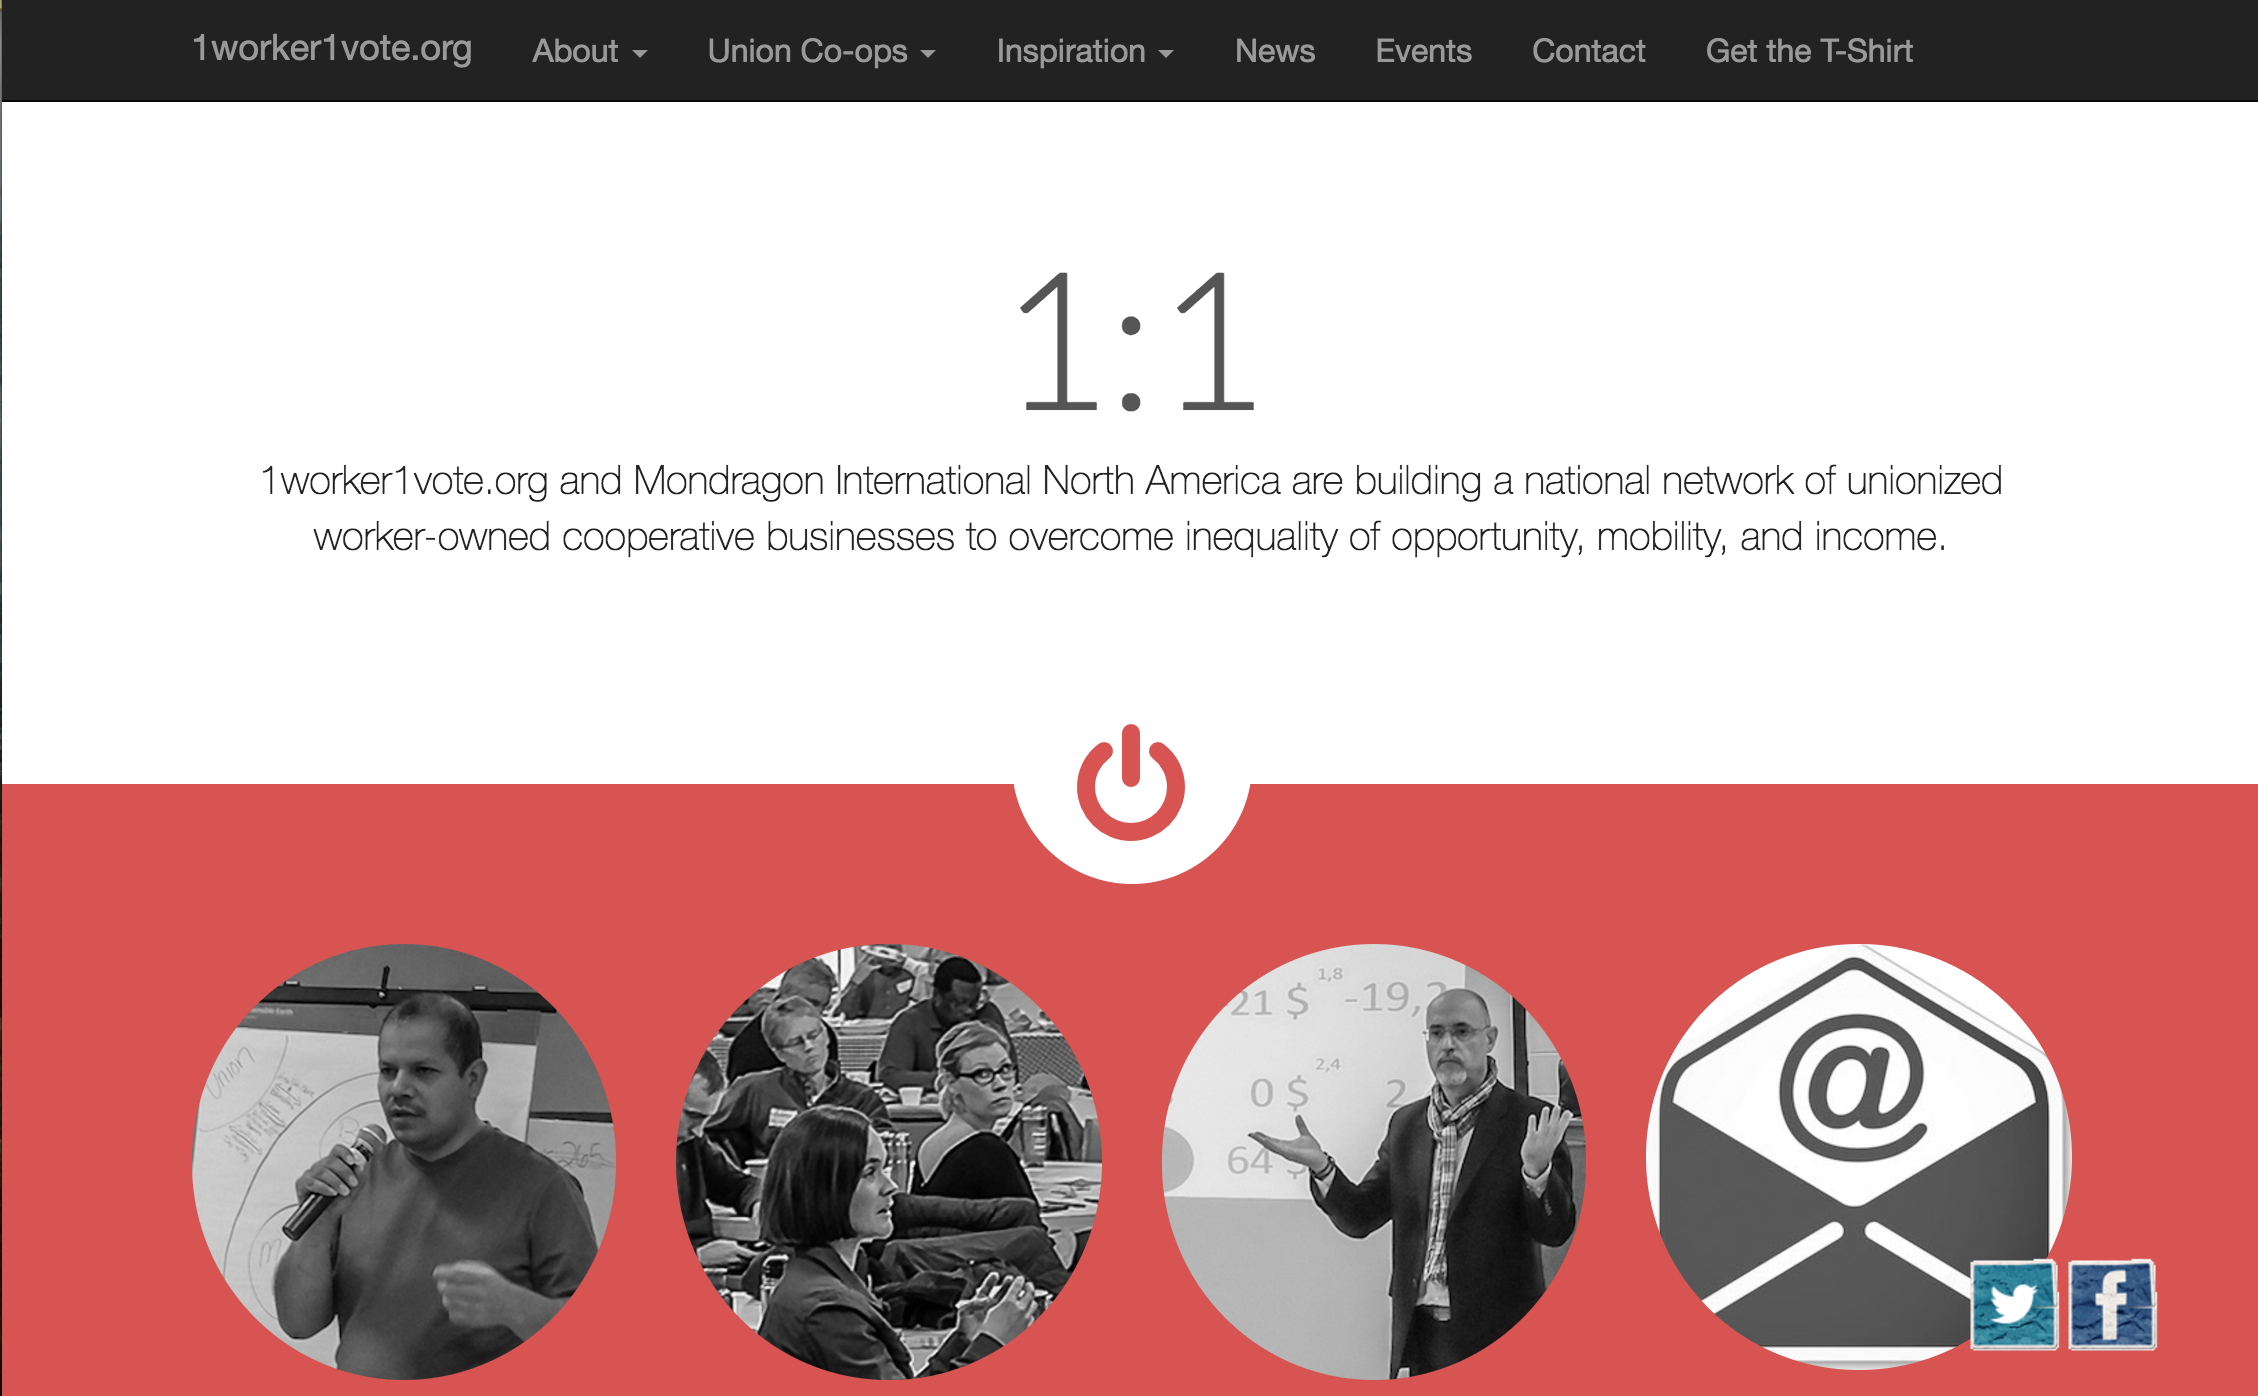 1worker1vote_website.png